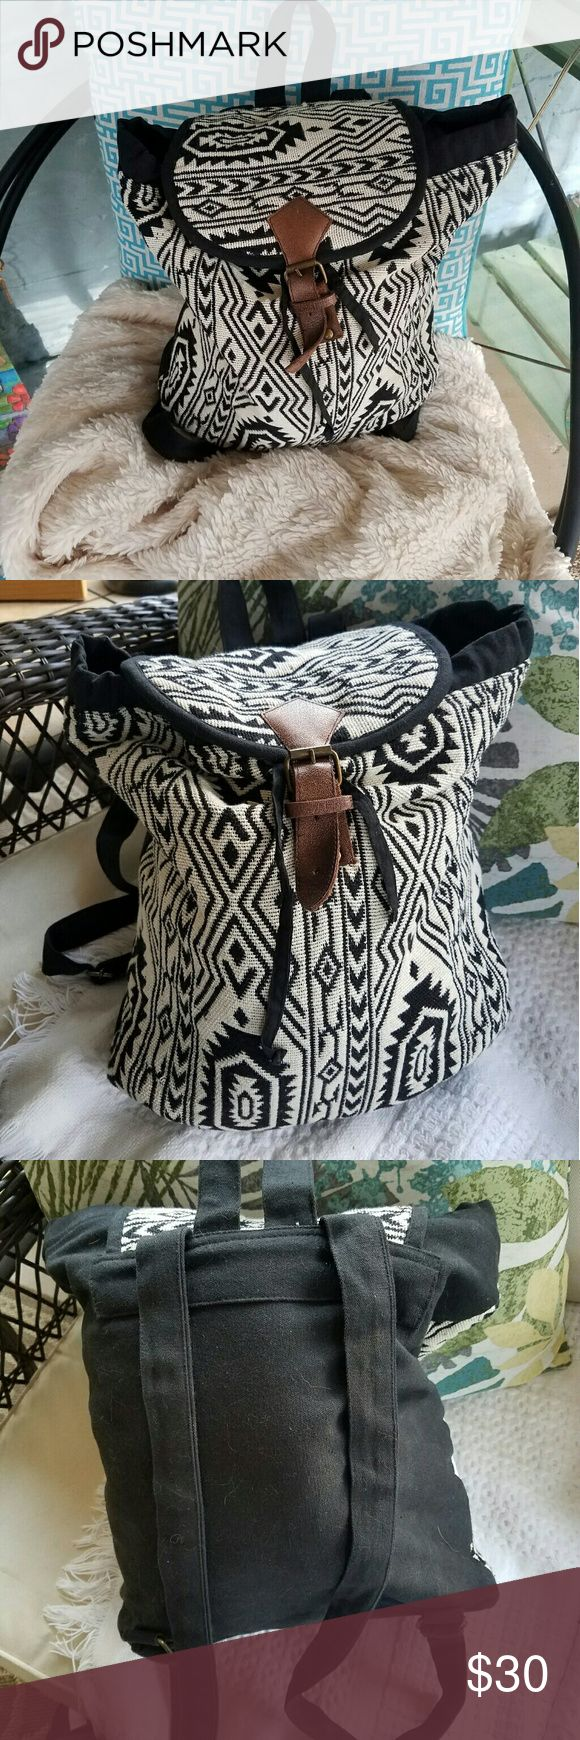 BOHEMIAN BOOKBAG World Market Fabric Bookbag  Beautiful pattern Adjustable straps  Draw pull and vegan leather buckle Bags Backpacks